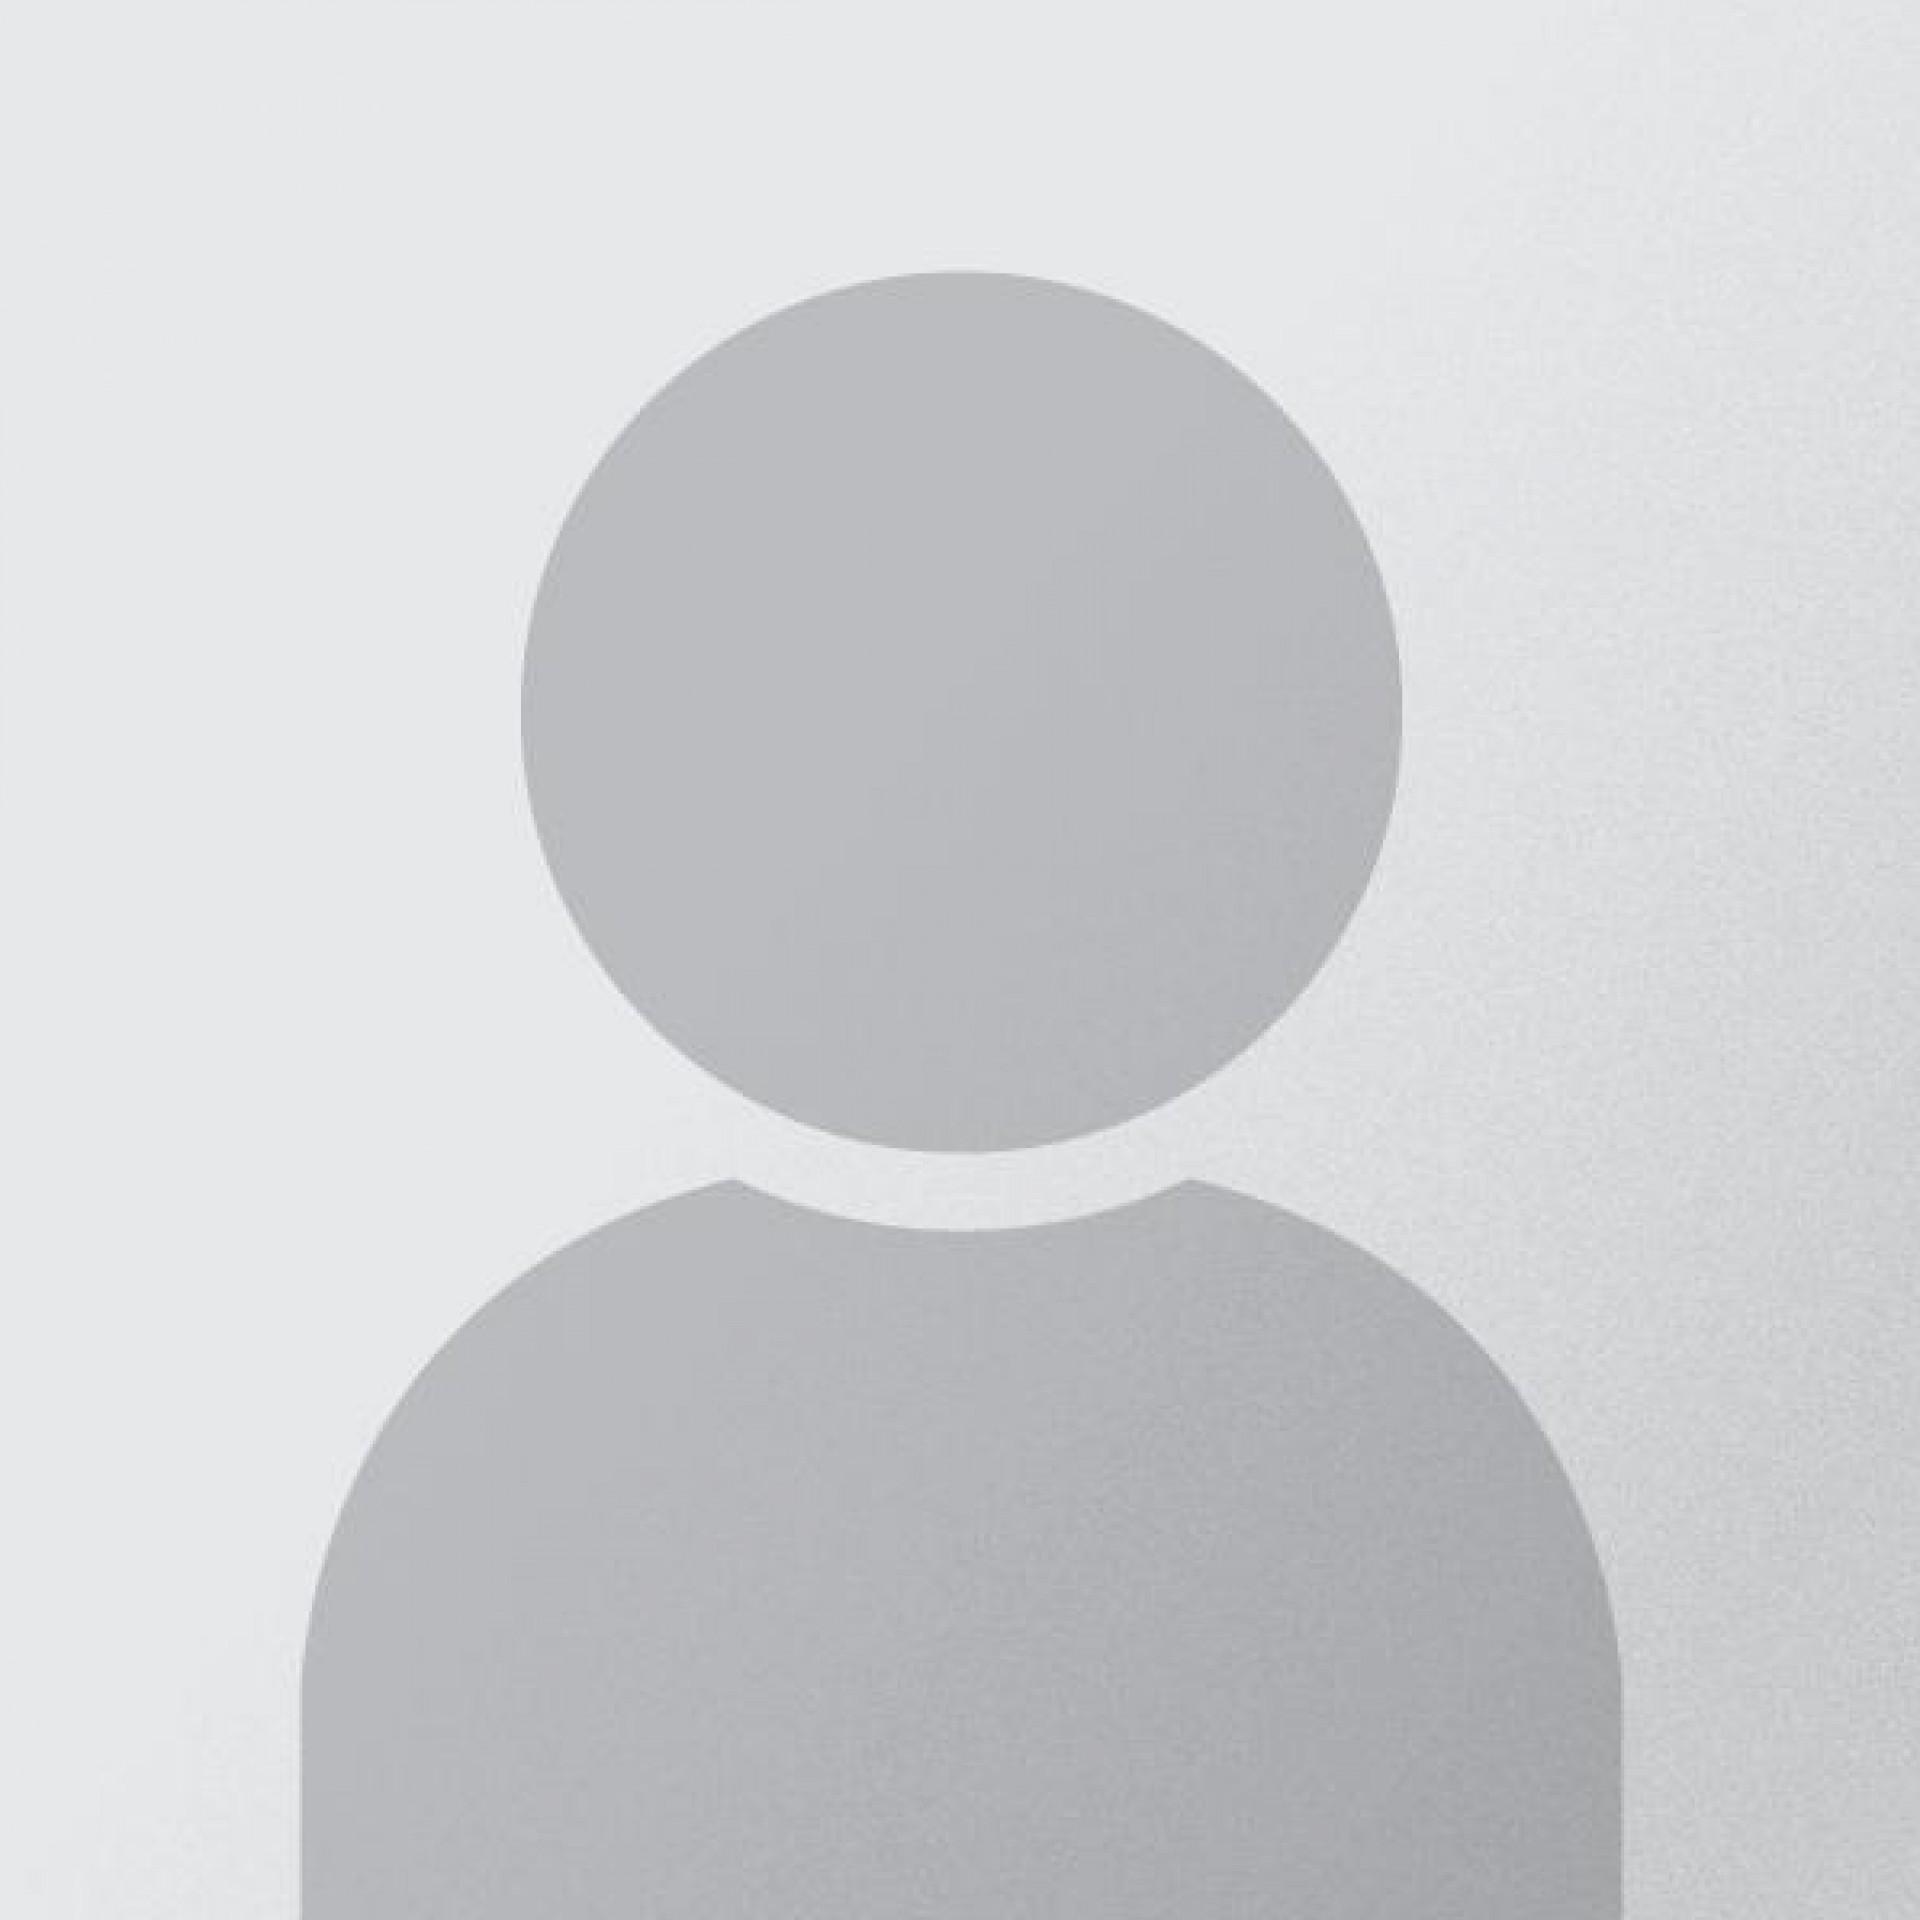 fotografia p021 profilu 0102IVNFWE